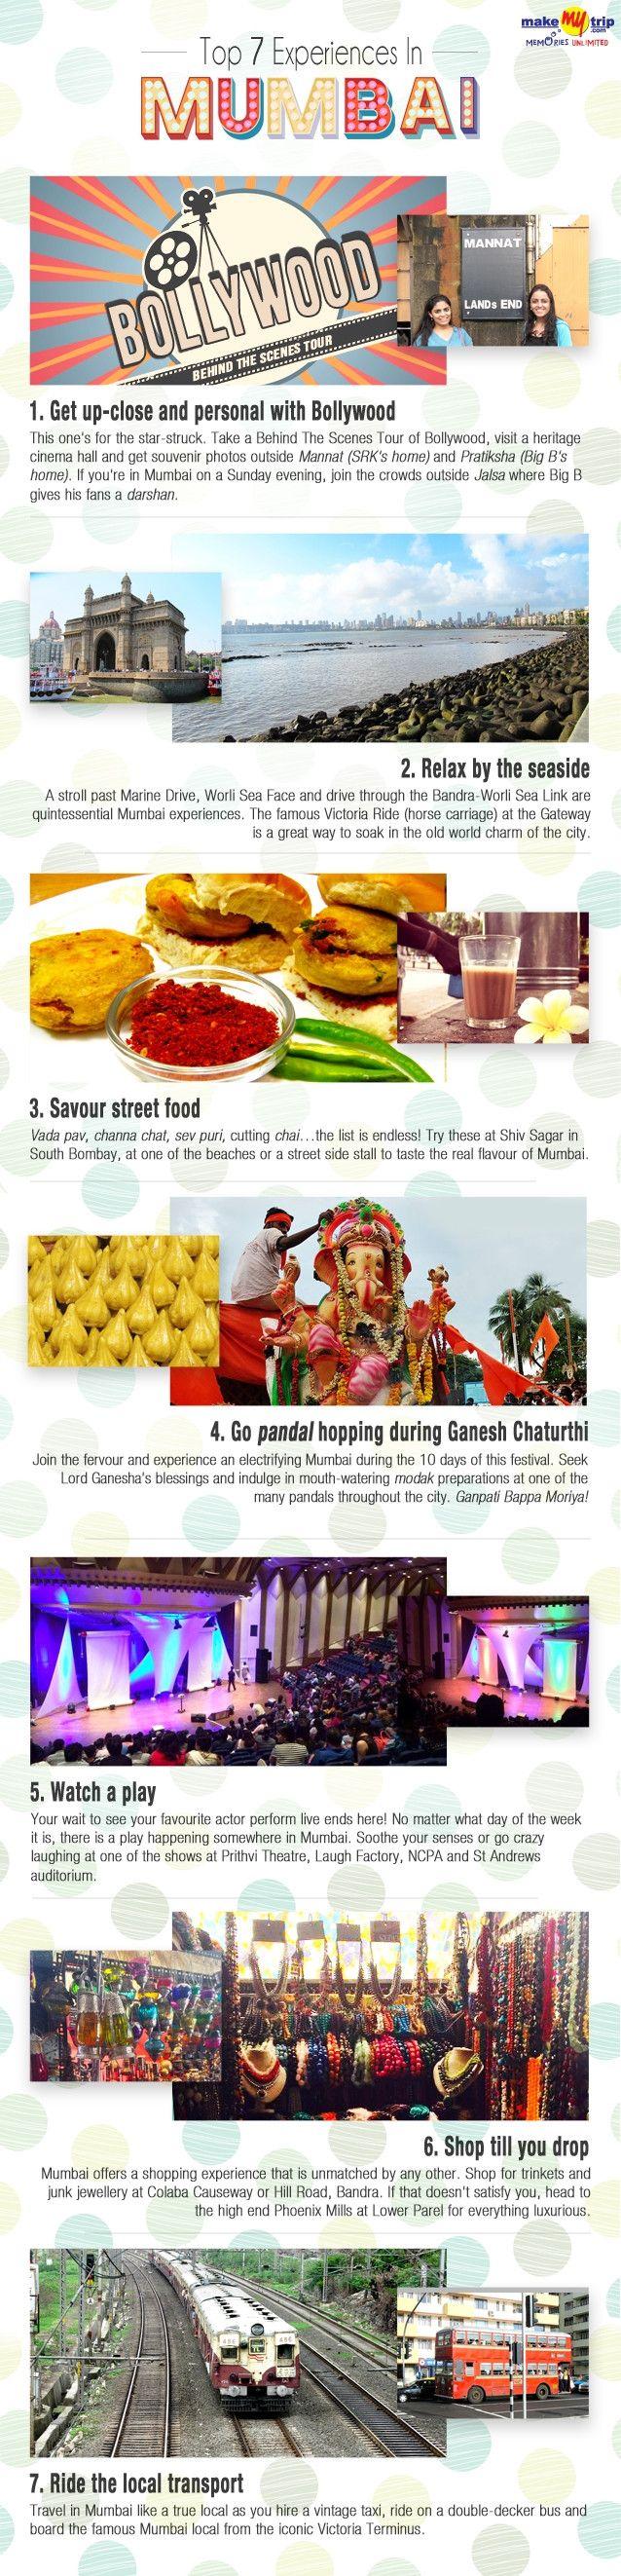 Top 7 Experiences In Mumbai   #India #Mumbai #Travel #infographic